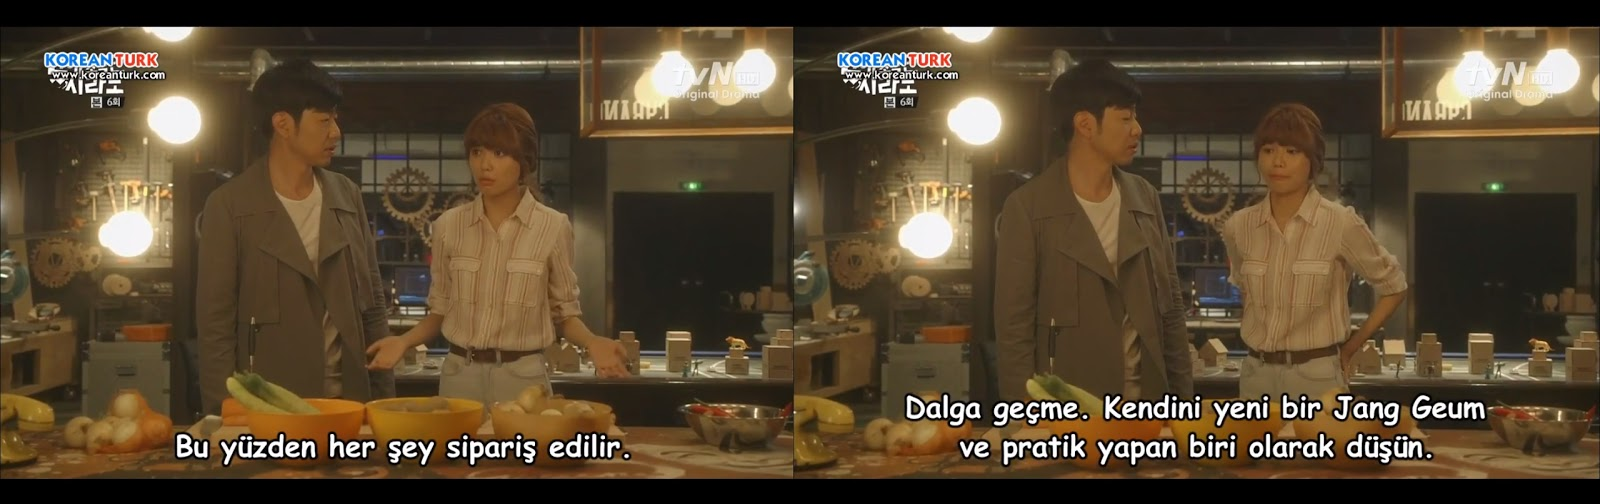 Flower Boy dating Bureau 1 bölüm yeppudaa